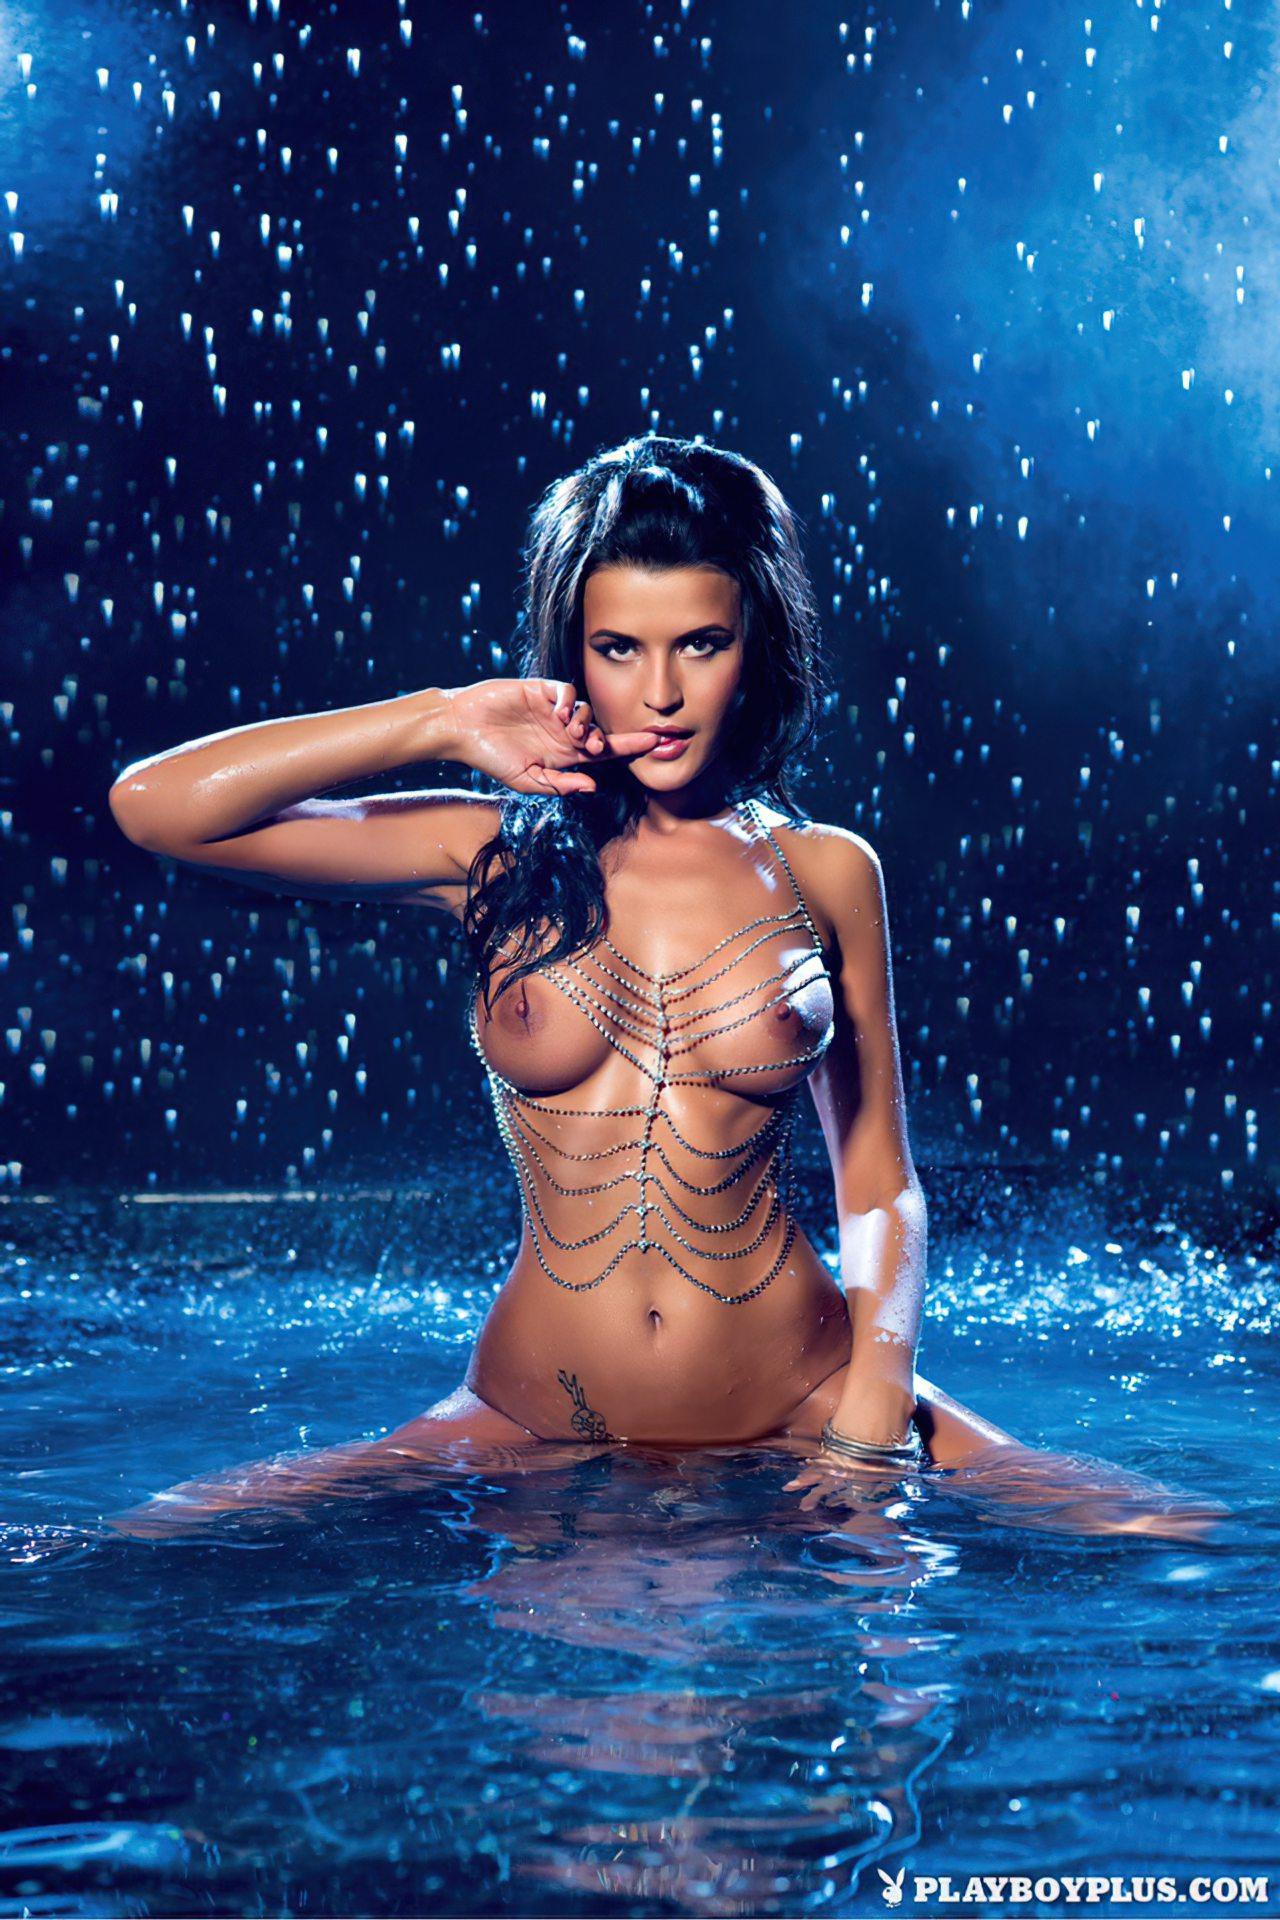 Oxana Bondarenko Playboy (4)